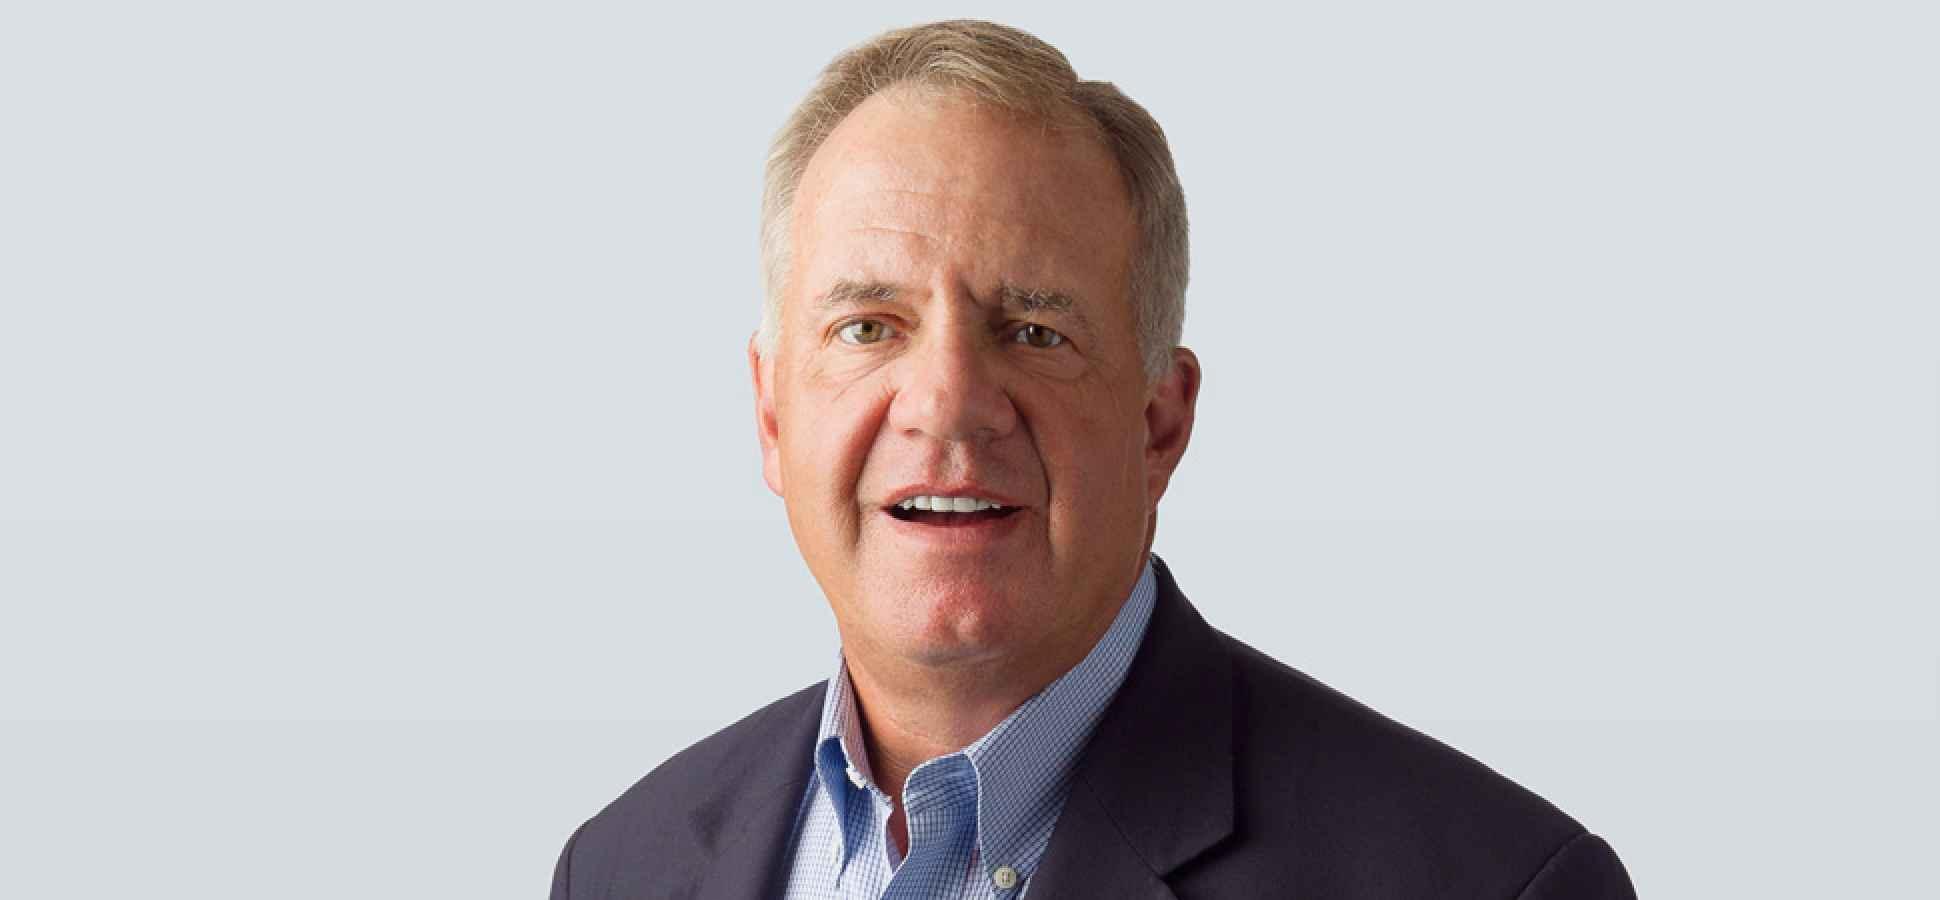 Staples' Tom Stemberg Advises Businesses to Avoid the 'Amazon Effect'